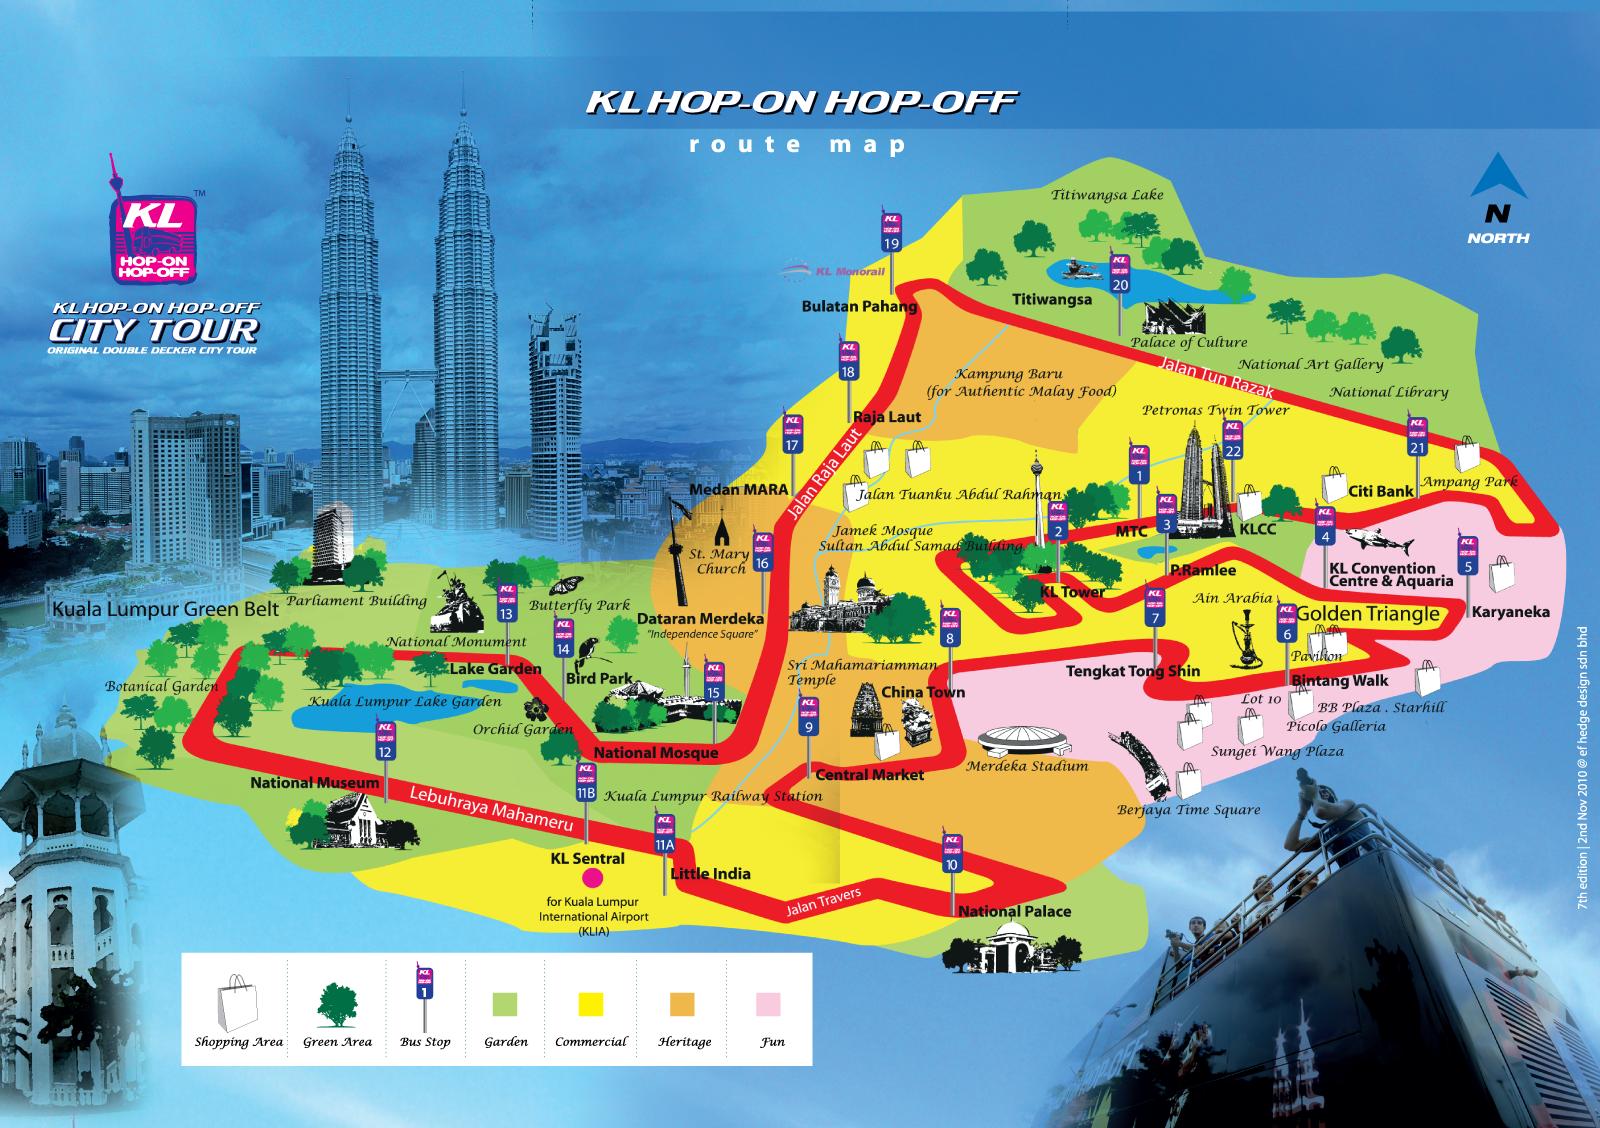 Карта маршрута hop-on hop-off